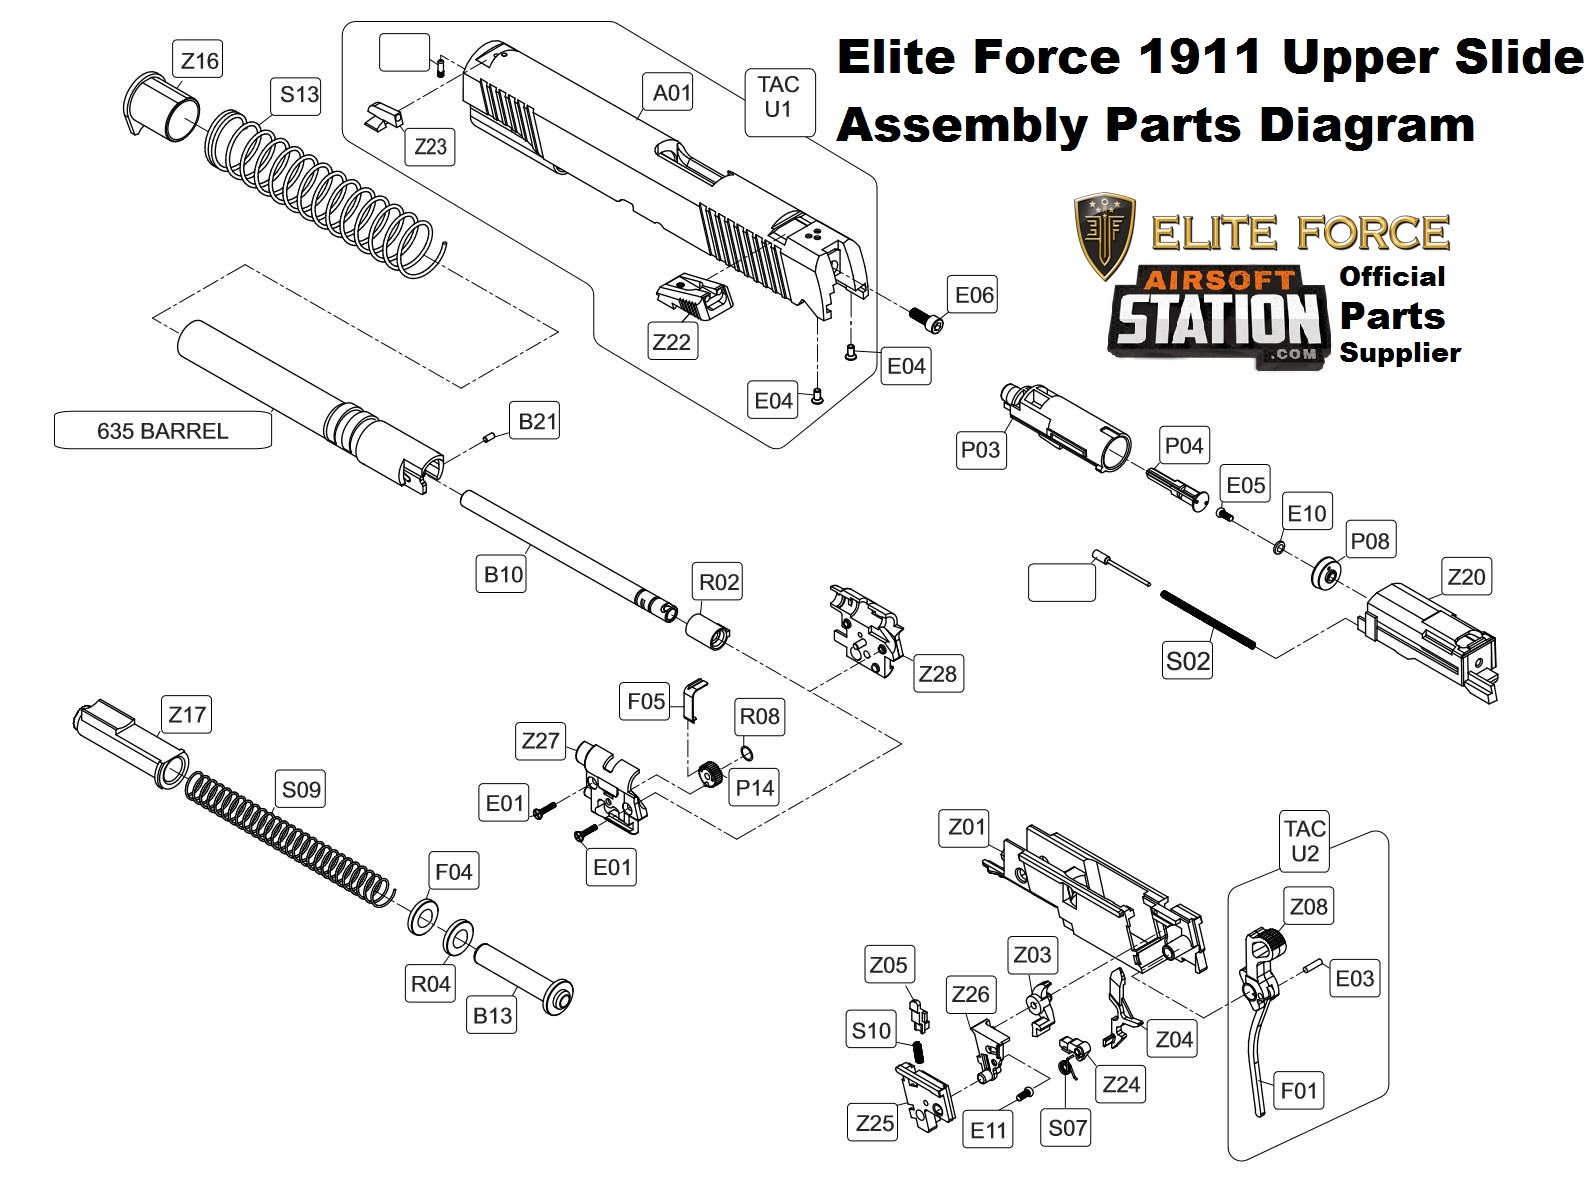 umarex elite force kwc 1911 a1 tac co2 pistol parts rh airsoftstation com M4 Carbine Parts Diagram airsoft gun parts diagram and dimensions